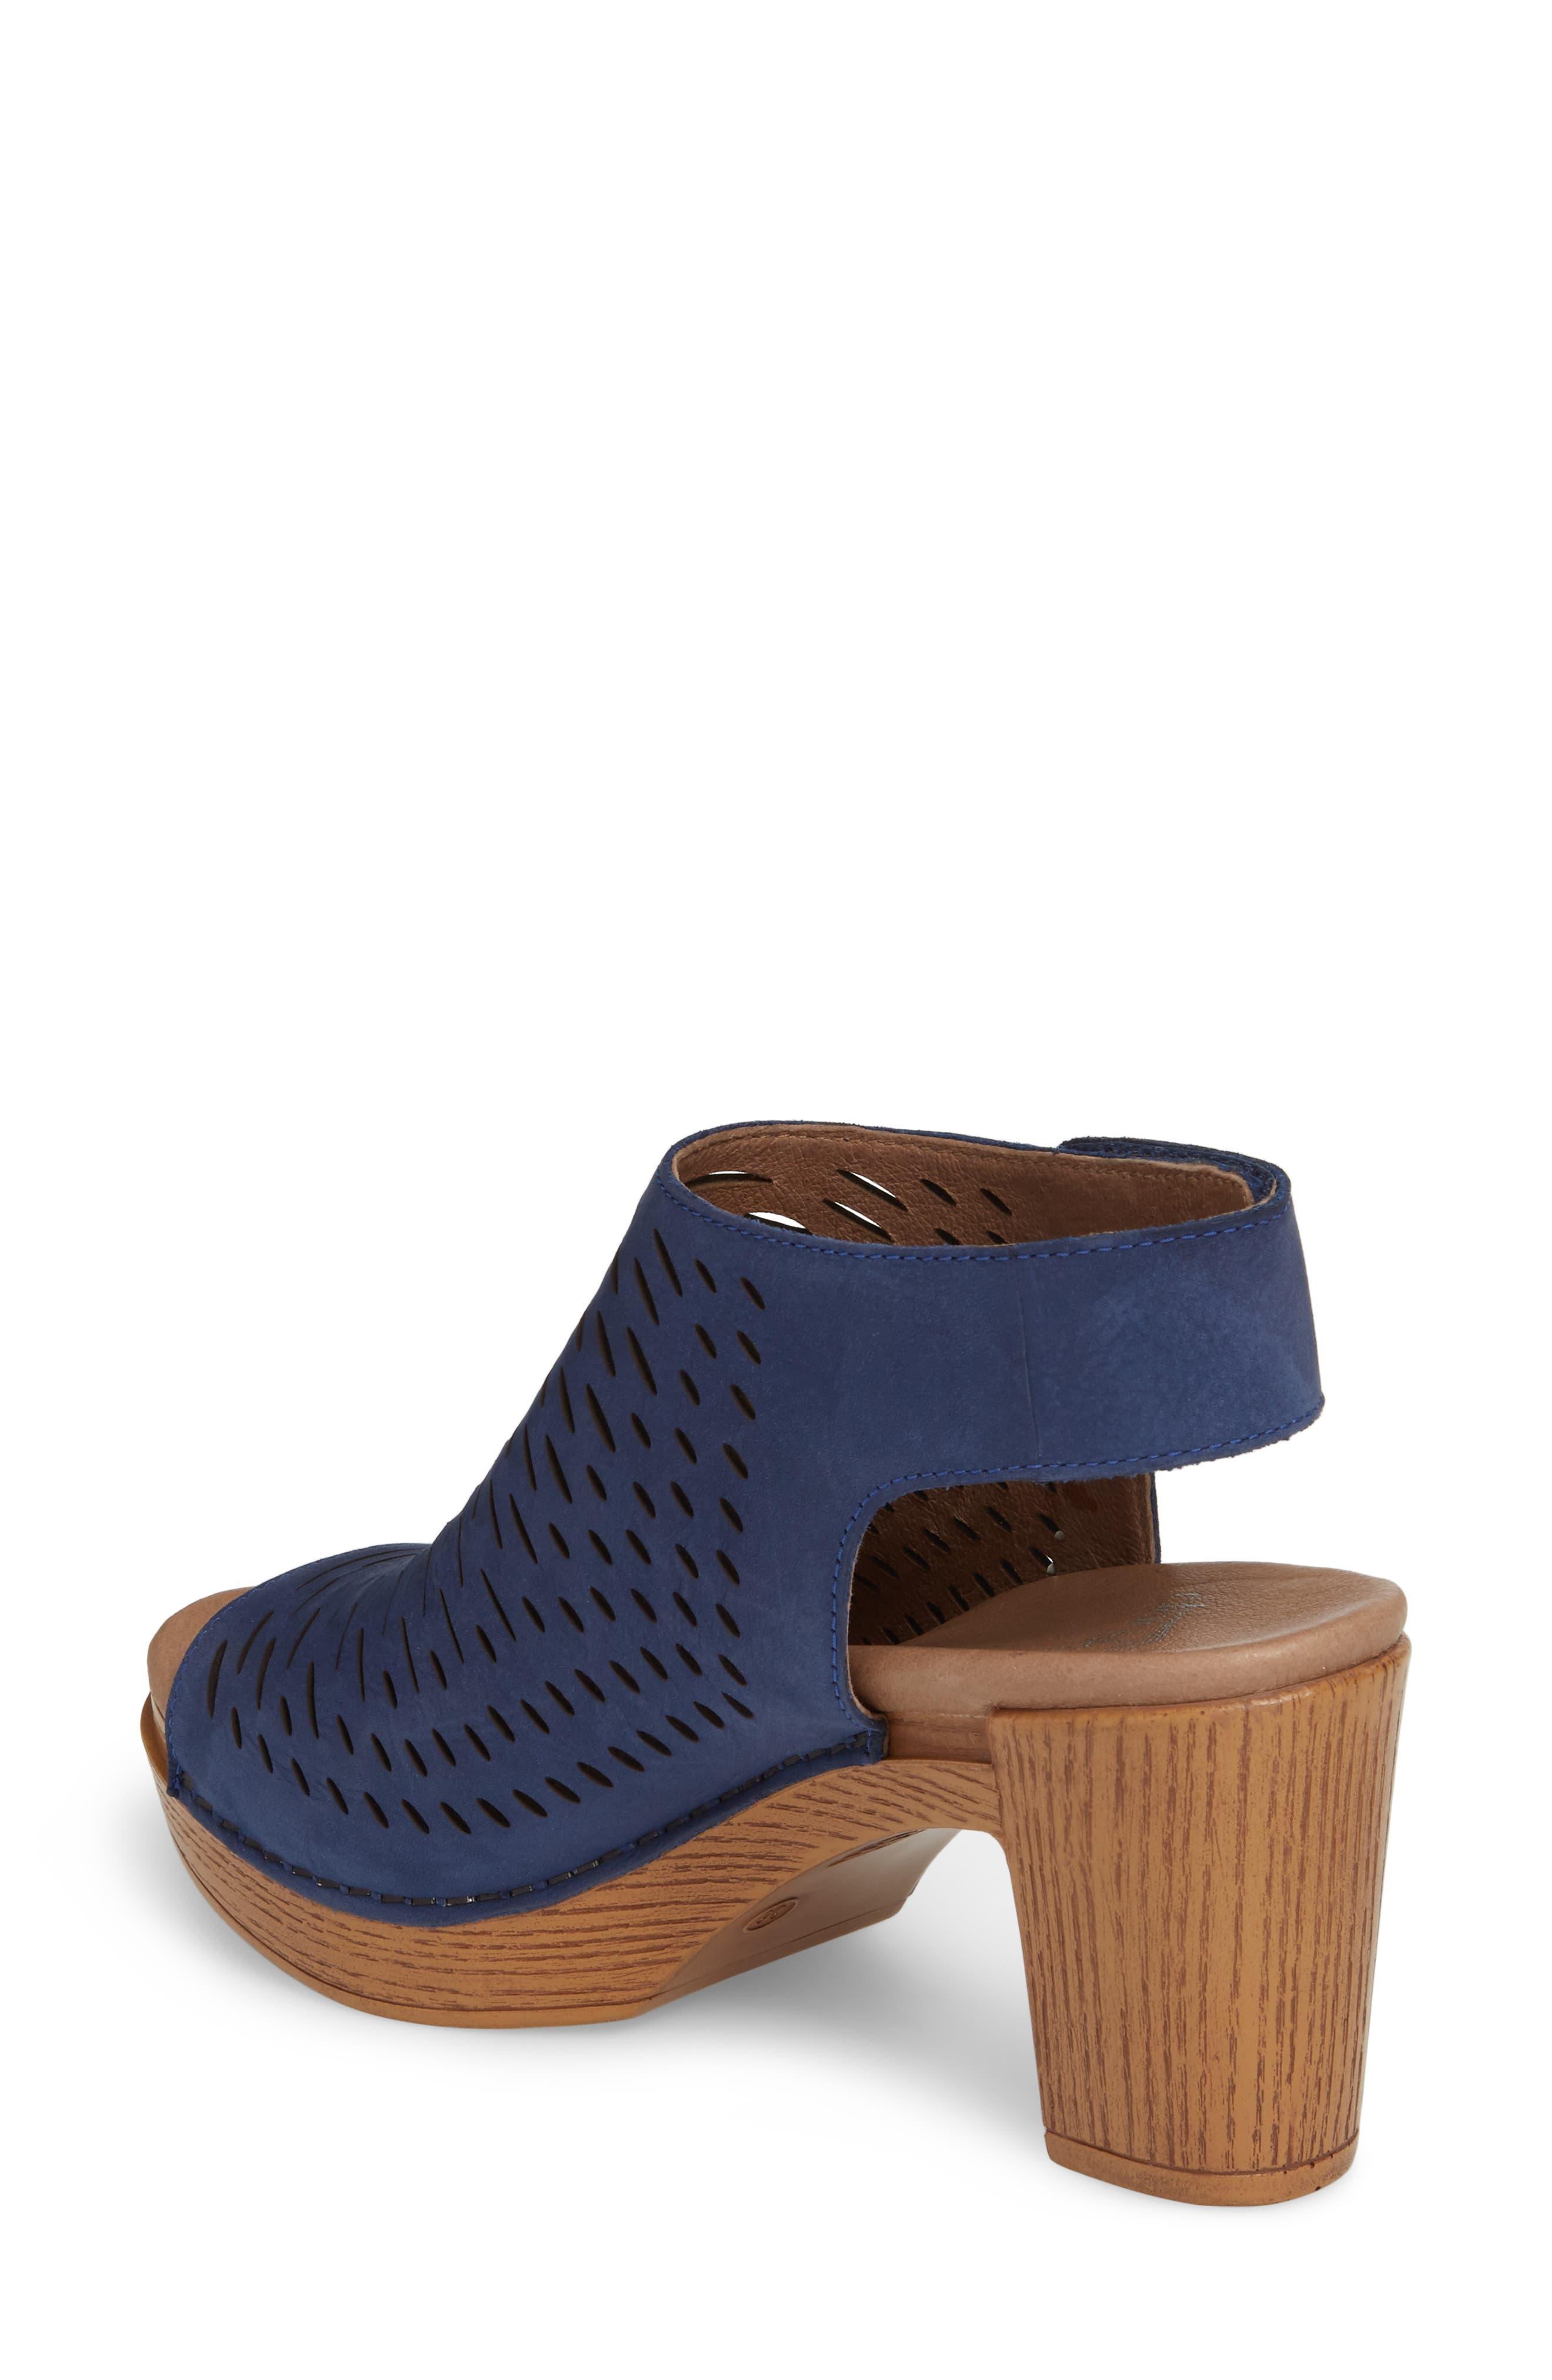 Danae Block Heel Sandal,                             Alternate thumbnail 2, color,                             Blue Milled Nubuck Leather